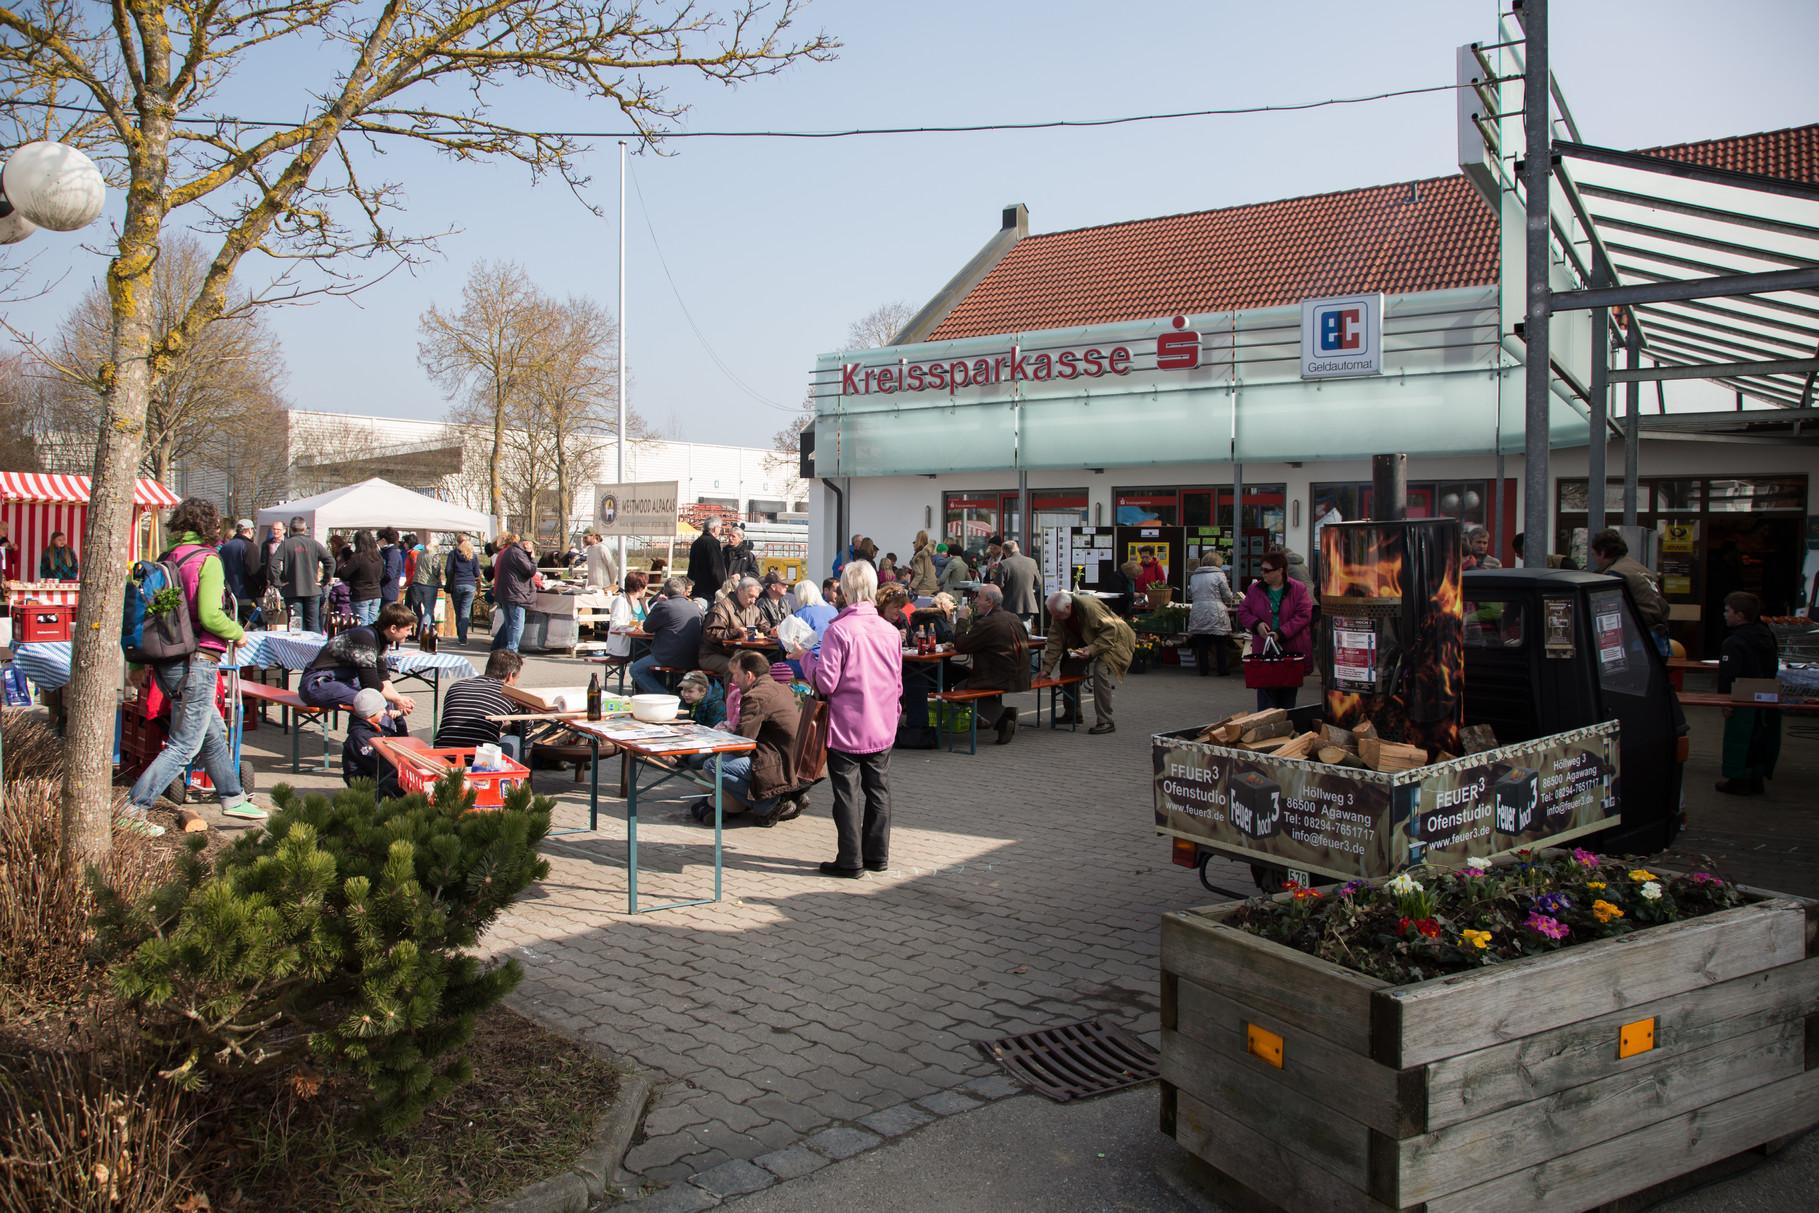 Marktflair in Horgau - bei Feuer3 gabs Stockbrot